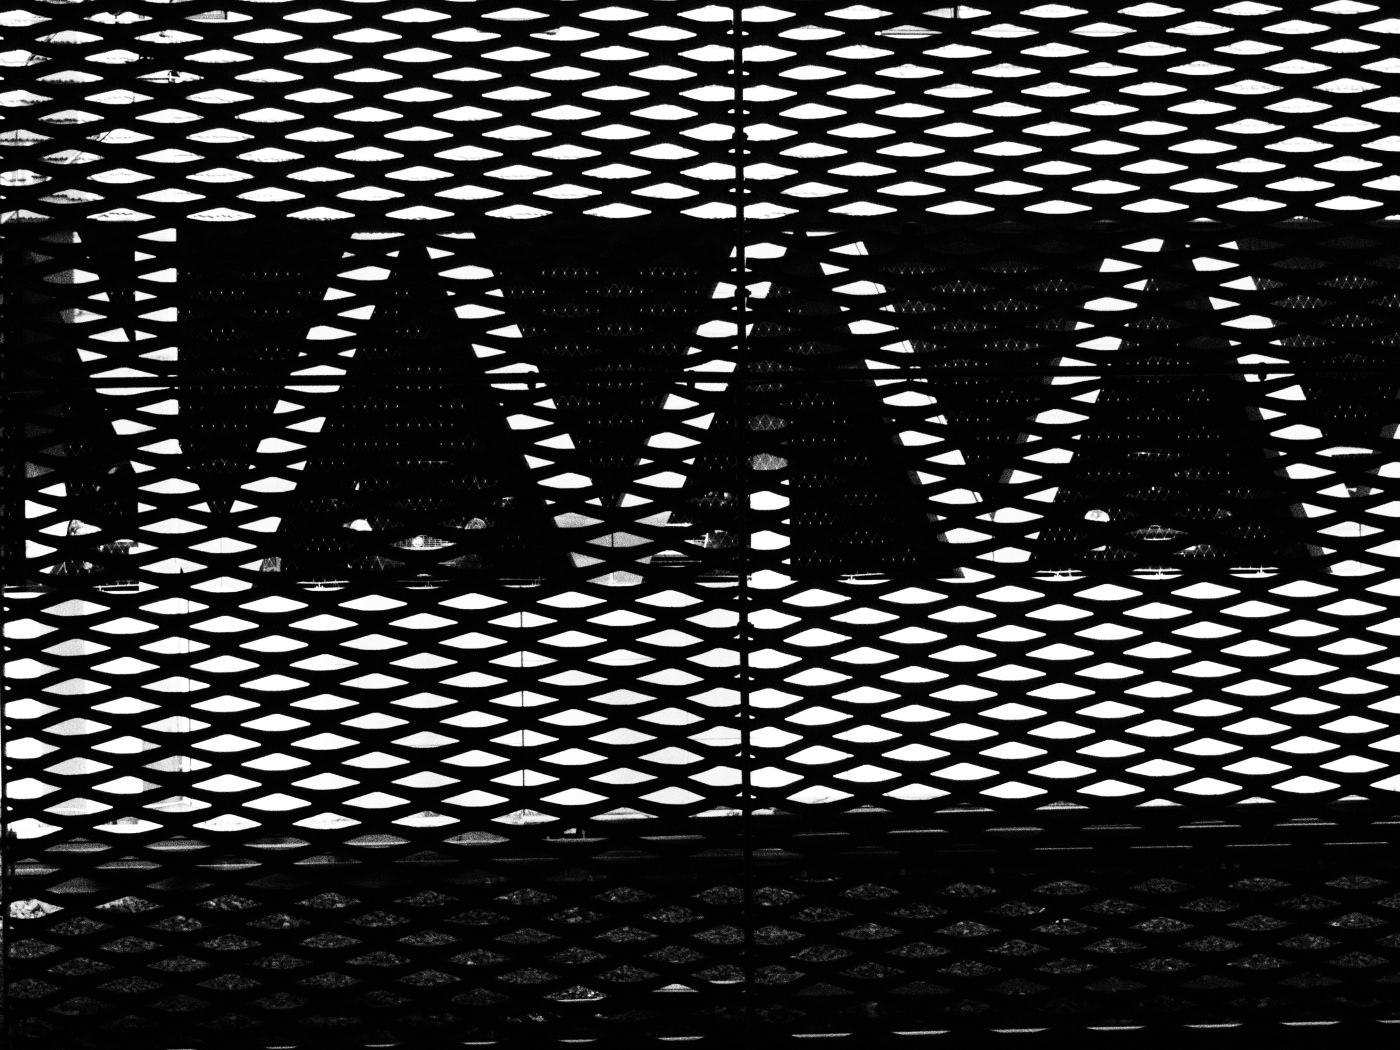 Leuven Station: 22.3.14